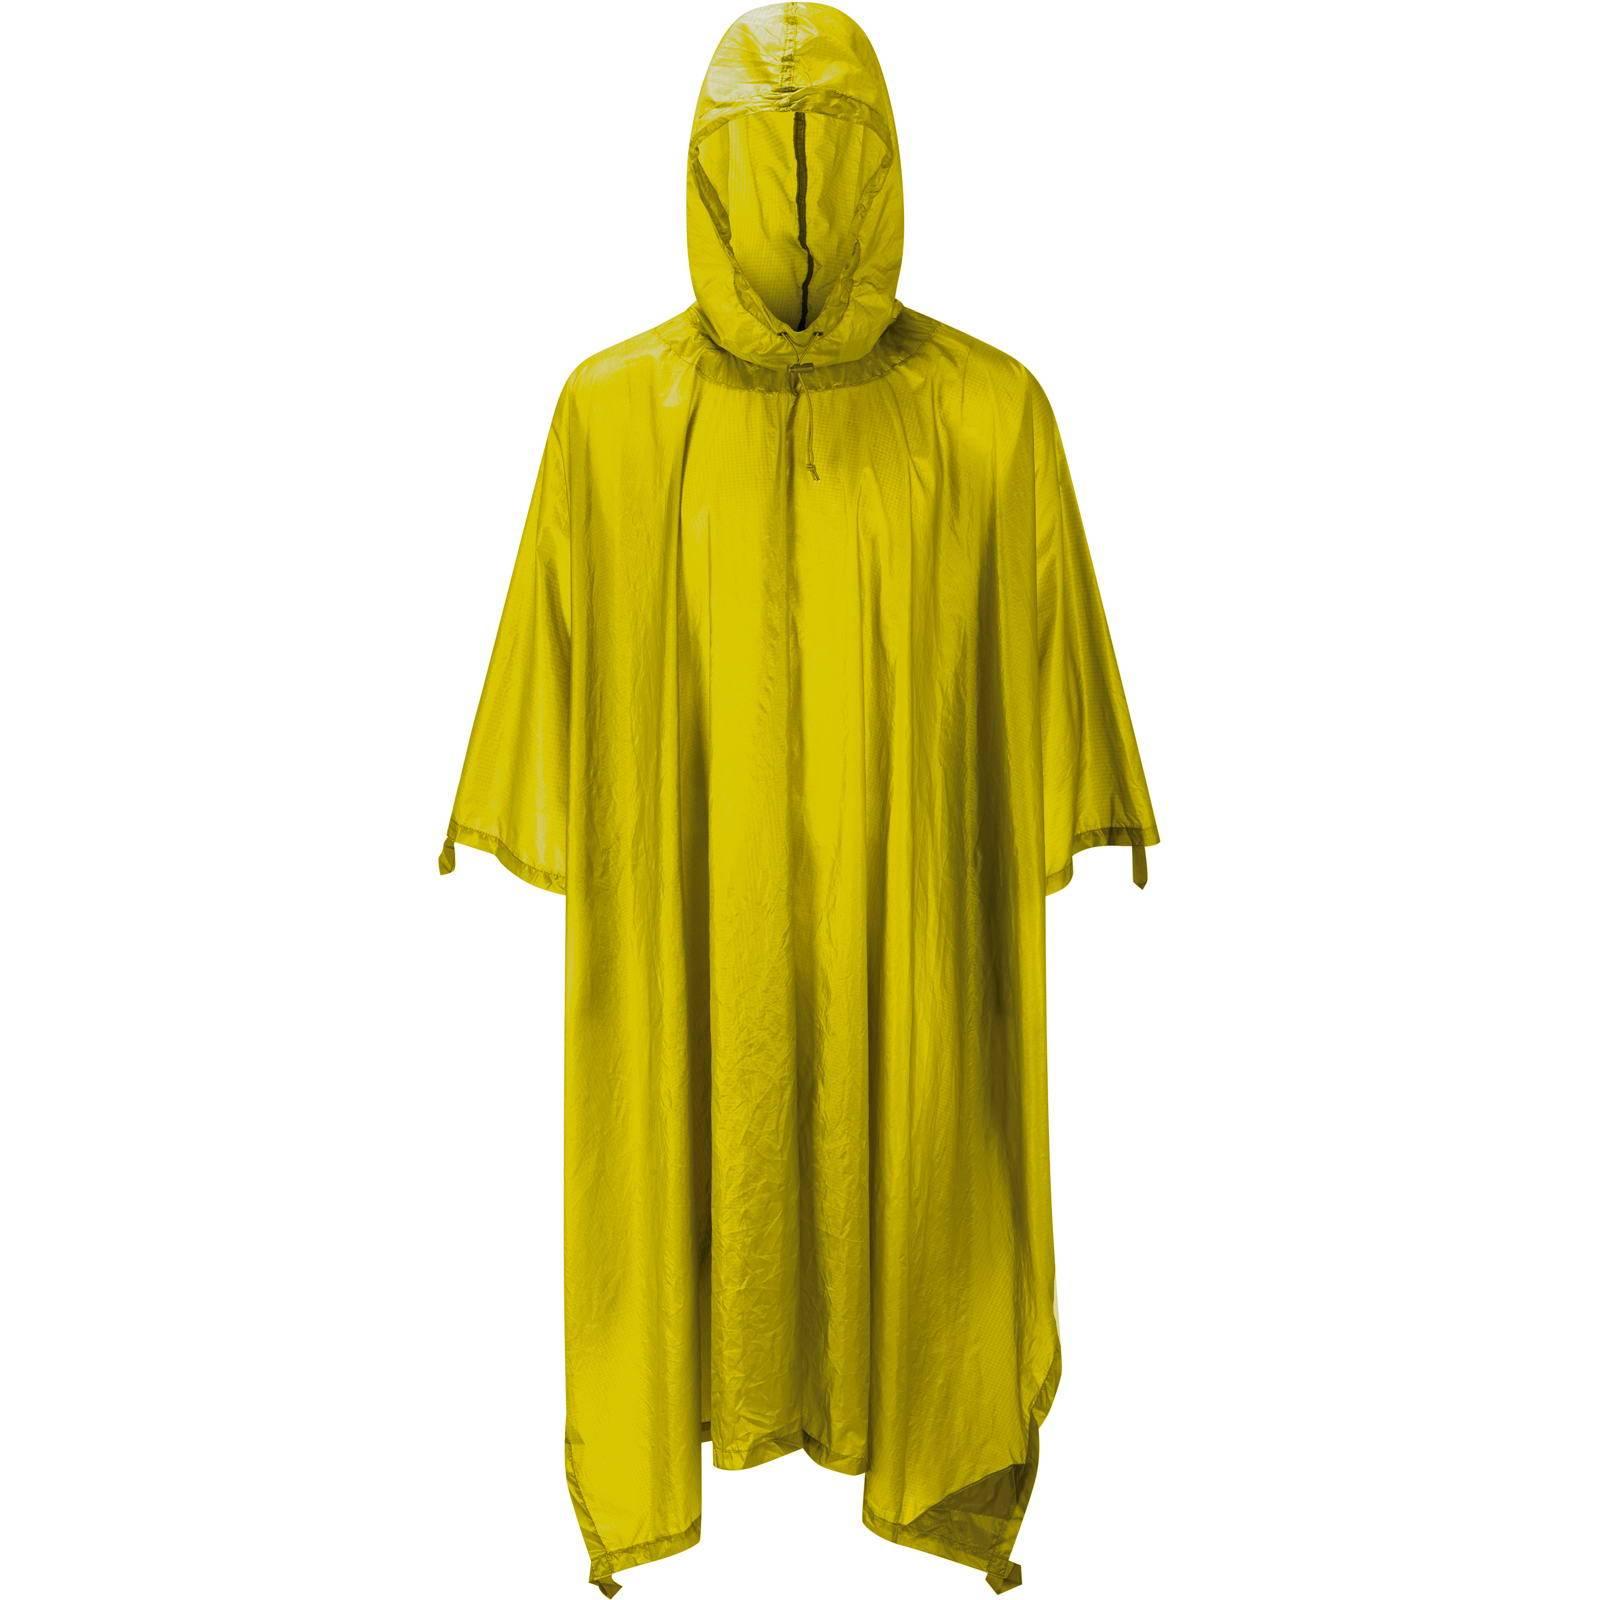 Rab SilPoncho - Regebponcho yellow